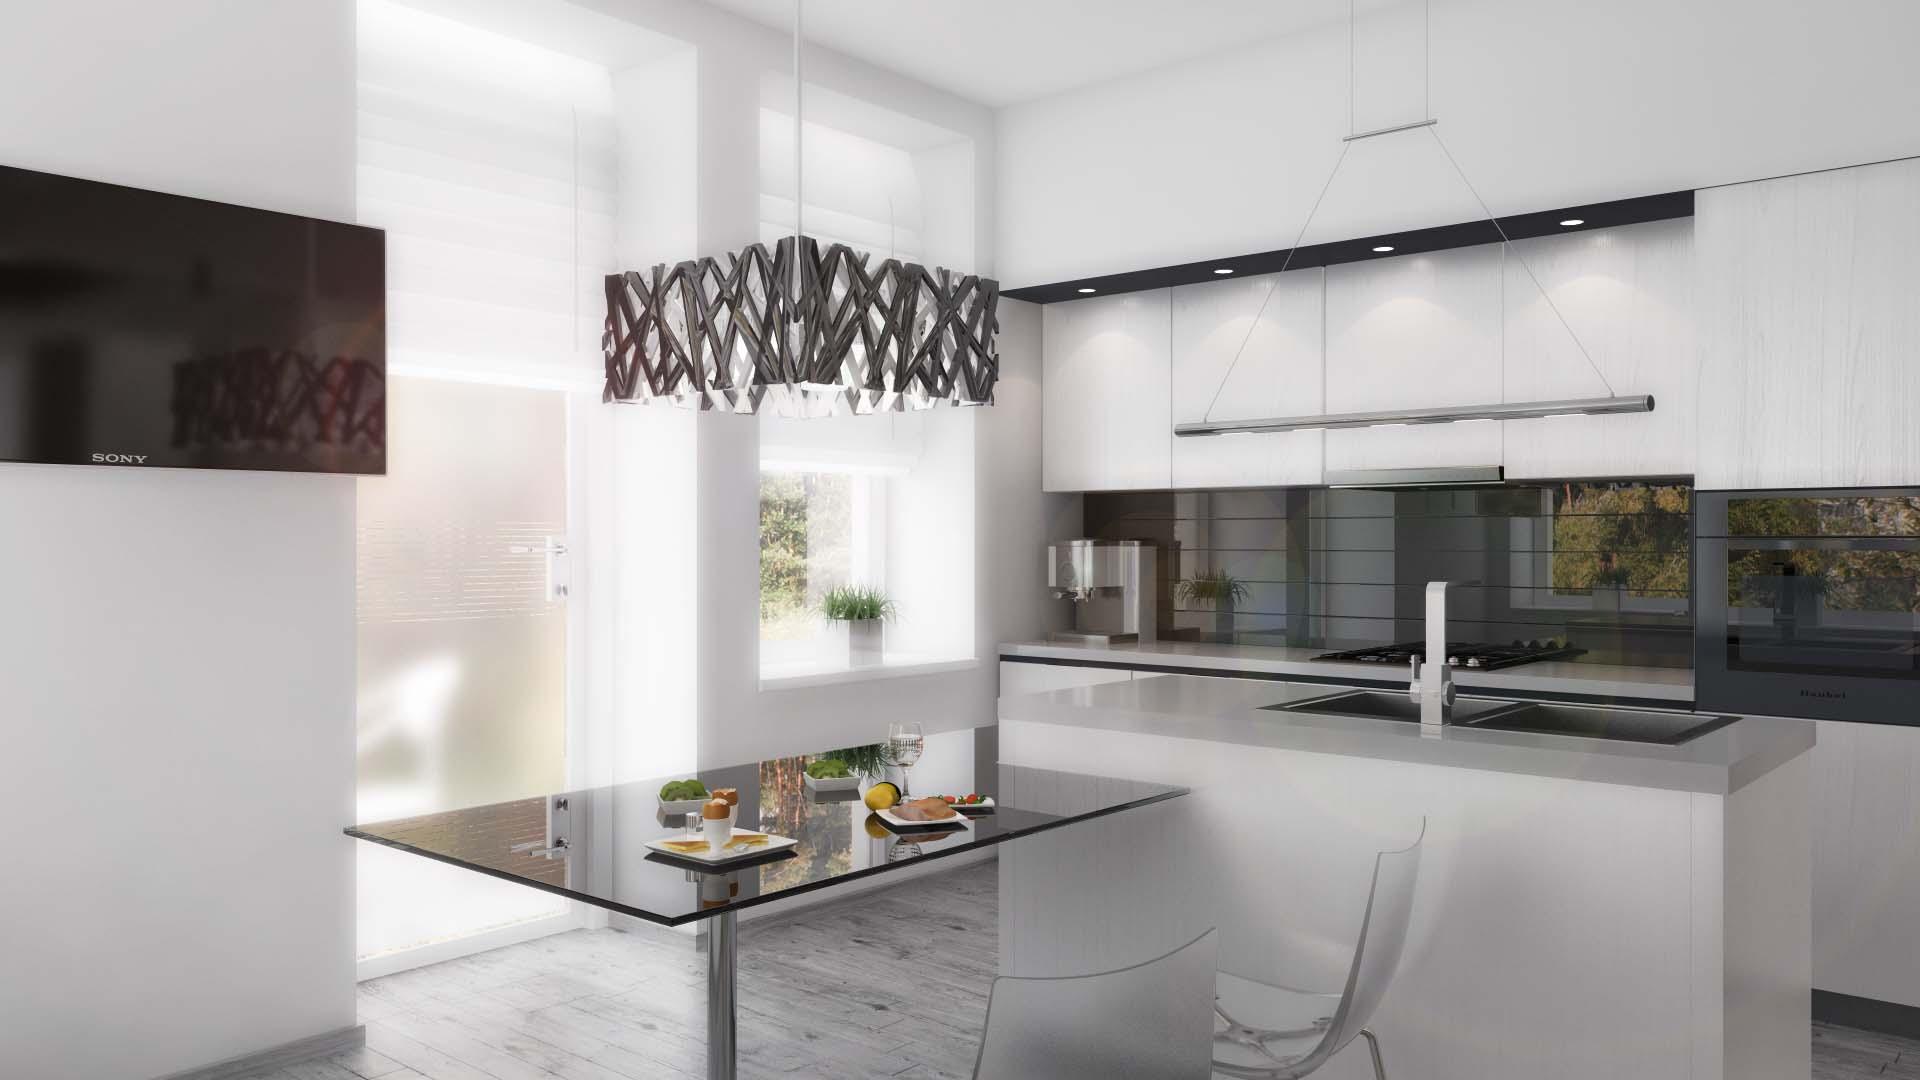 Arredare la cucina con binova urban bva for Casa habitacion minimalista